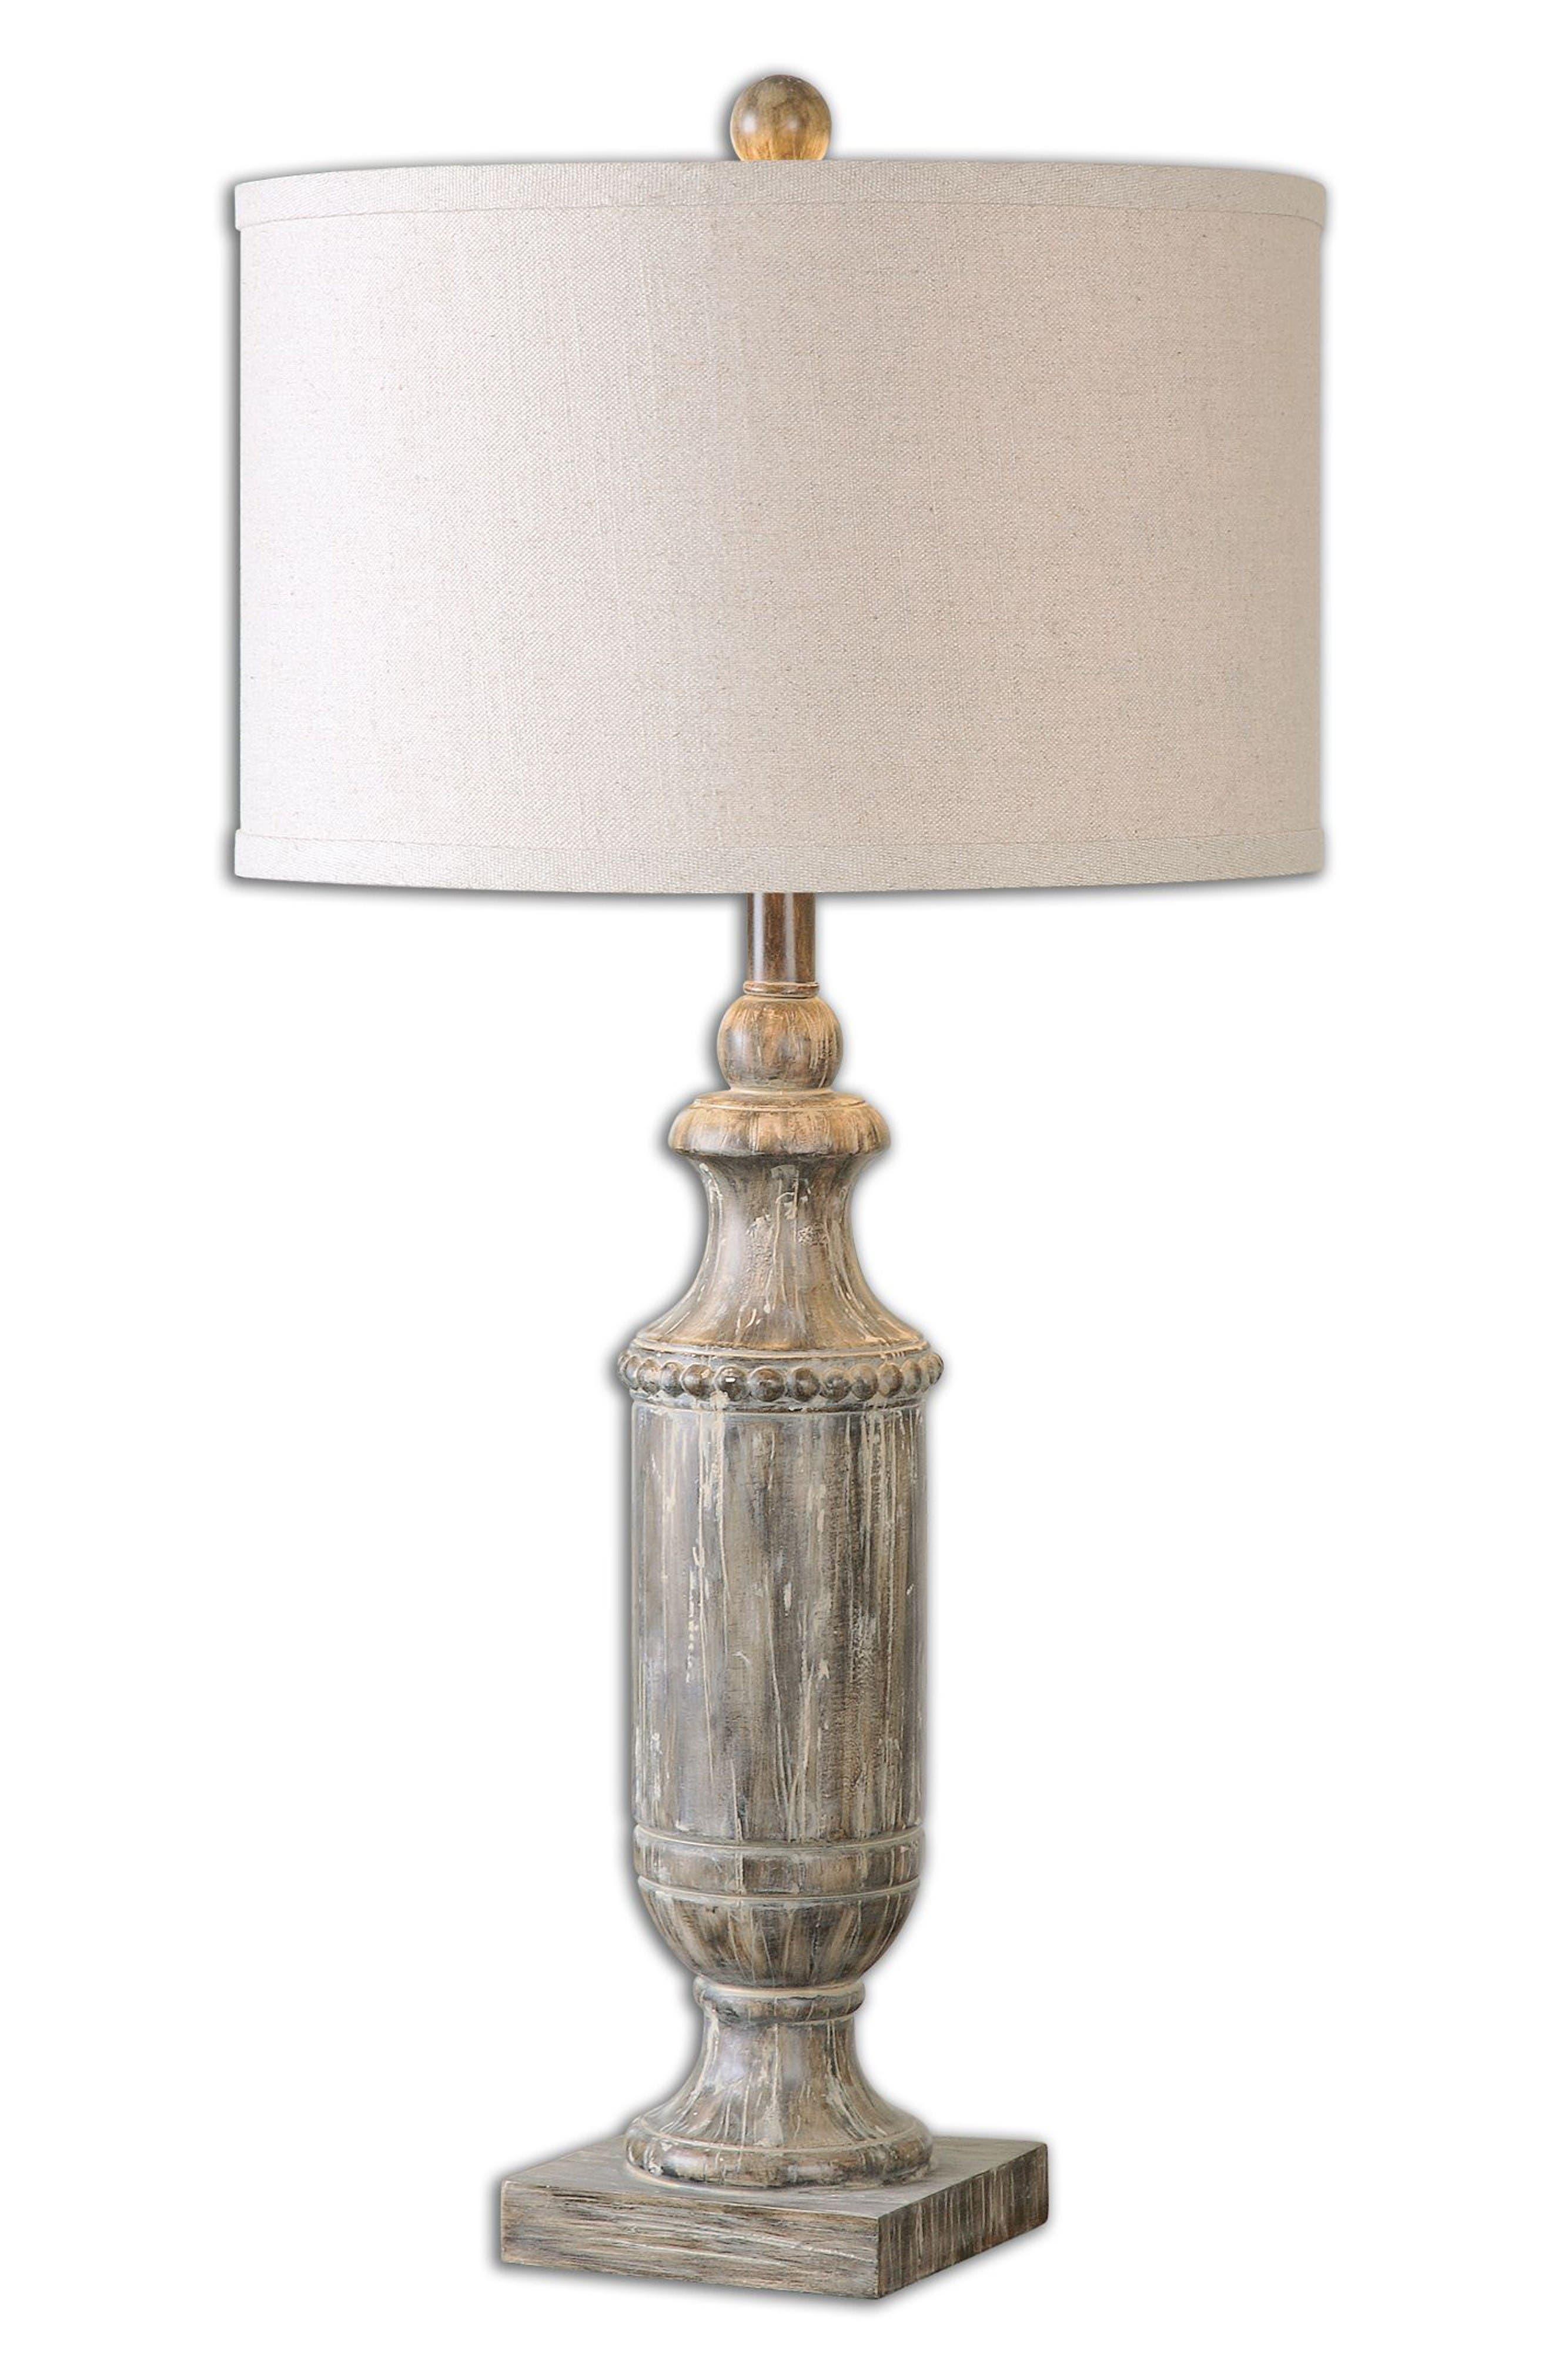 Main Image - Uttermost Agliano Table Lamp